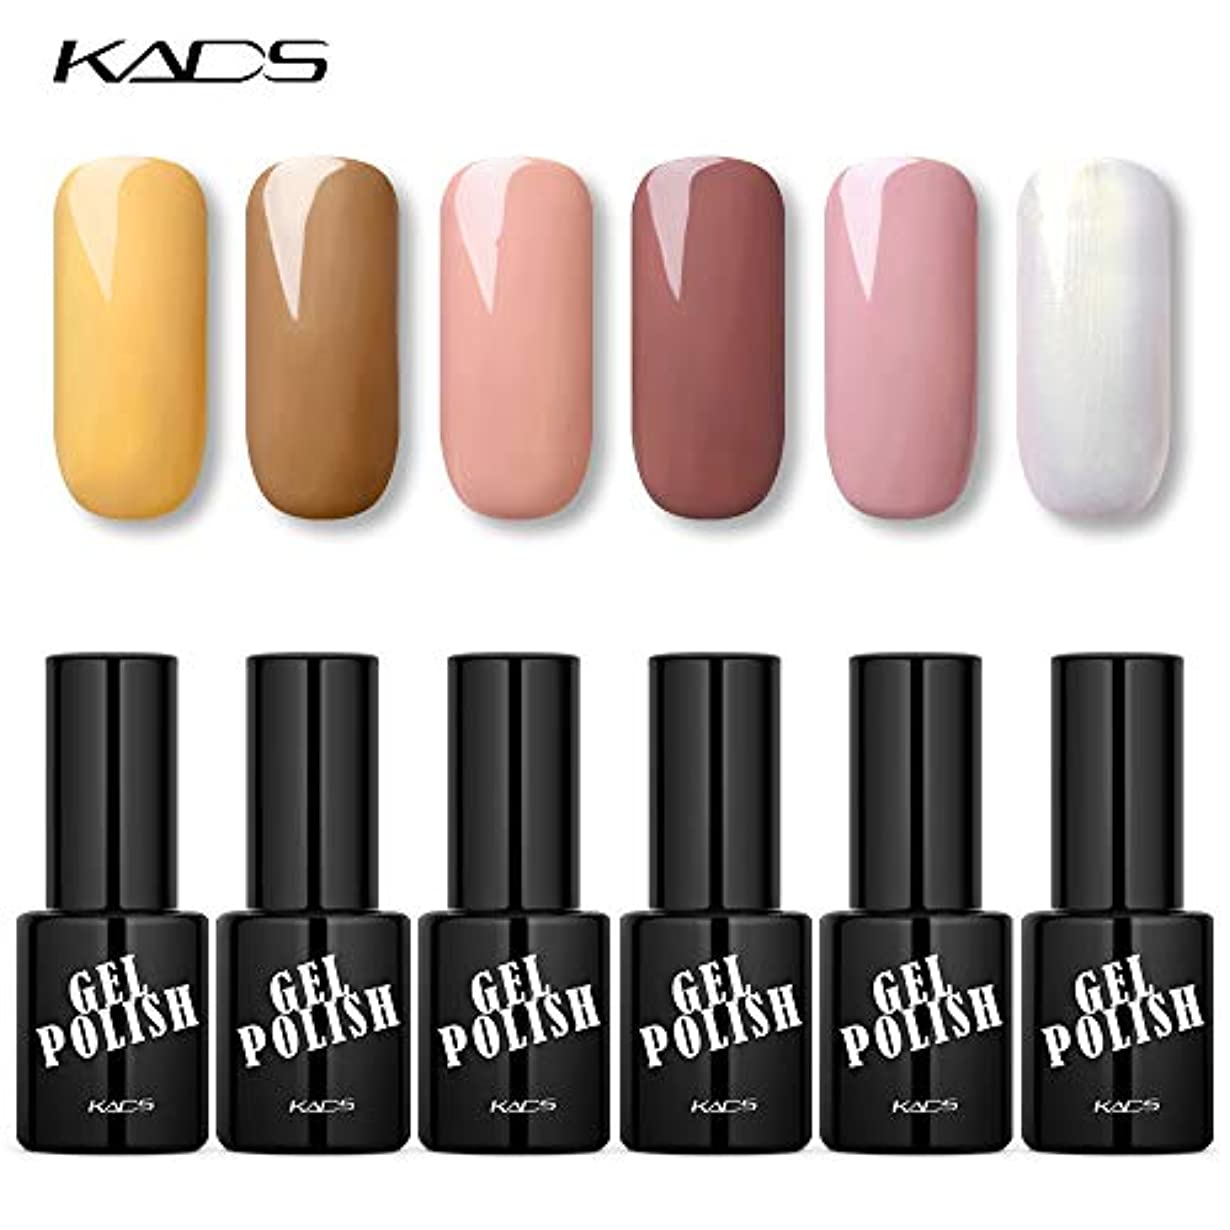 KADS ジェルネイル カラージェル 6色セット 9.5ML UV?LED対応 艶長持ち ピンク+カーキ系